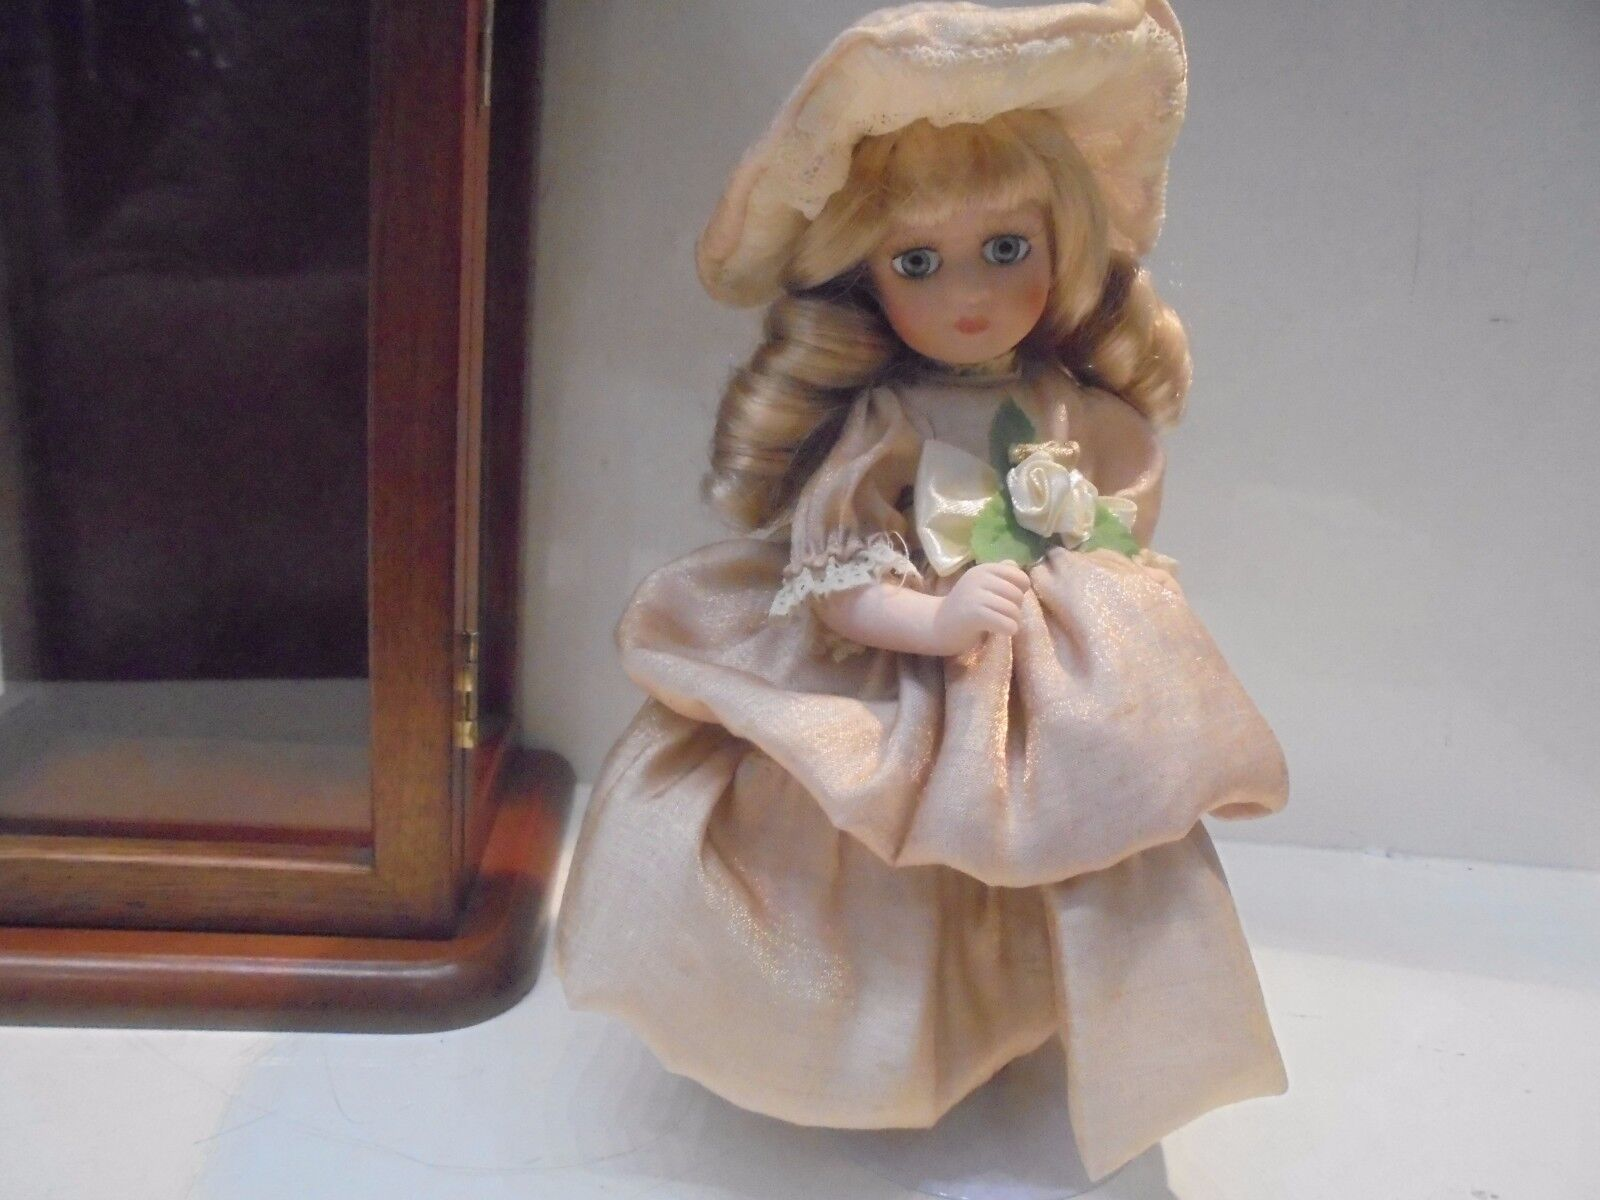 BAMBOLA PORCELLANA CON CON CON ABITO IN SETA IN TECA DI LEGNO - PORCELAIN bambola 80d148